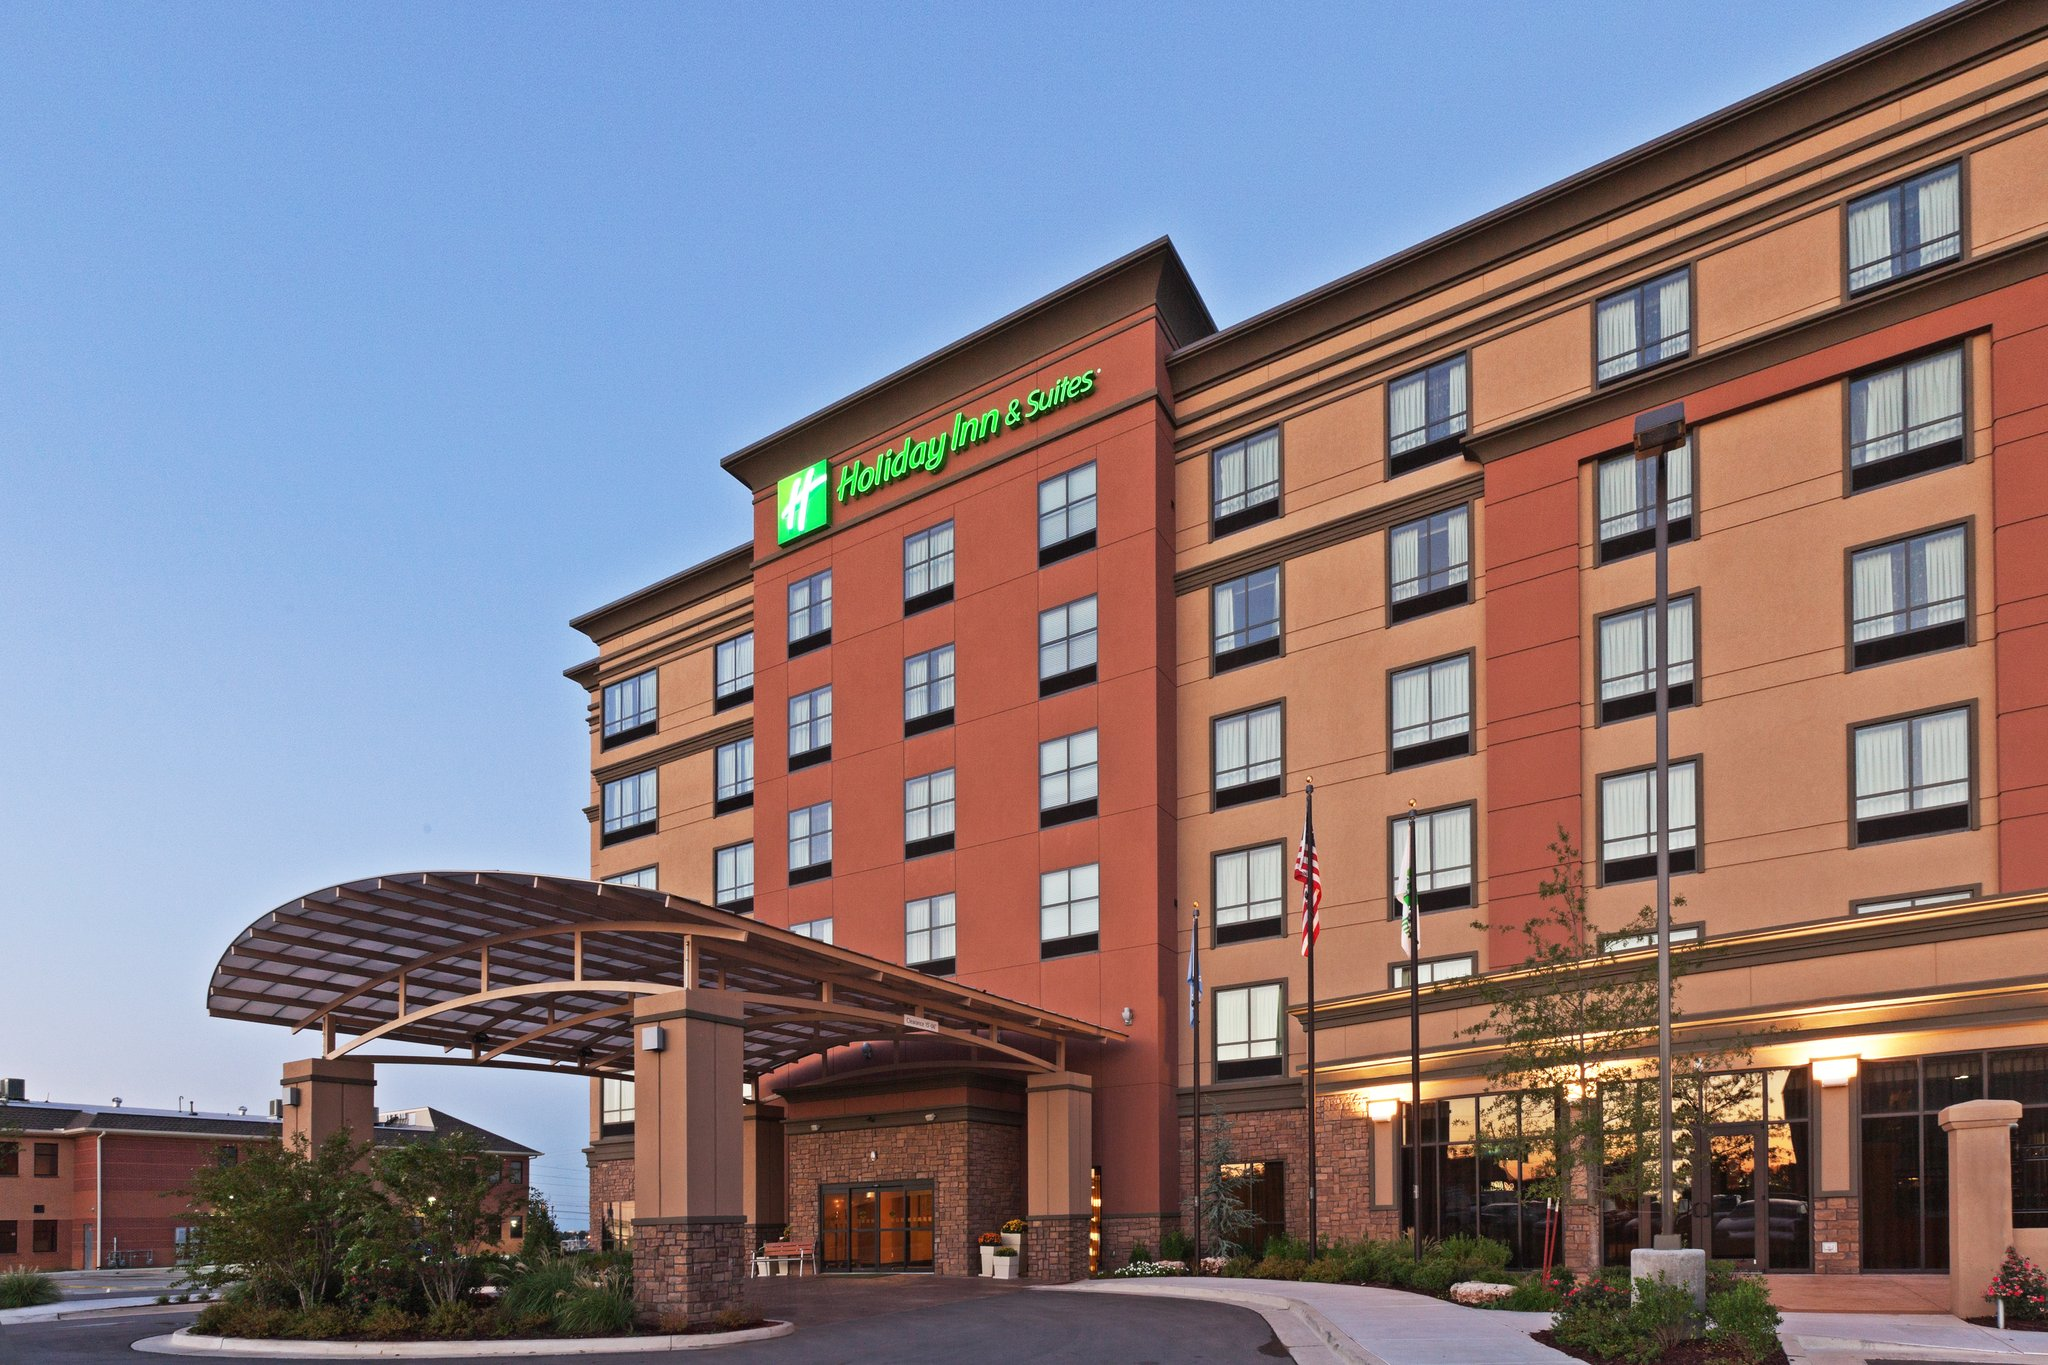 Holiday Inn & Suites Tulsa South